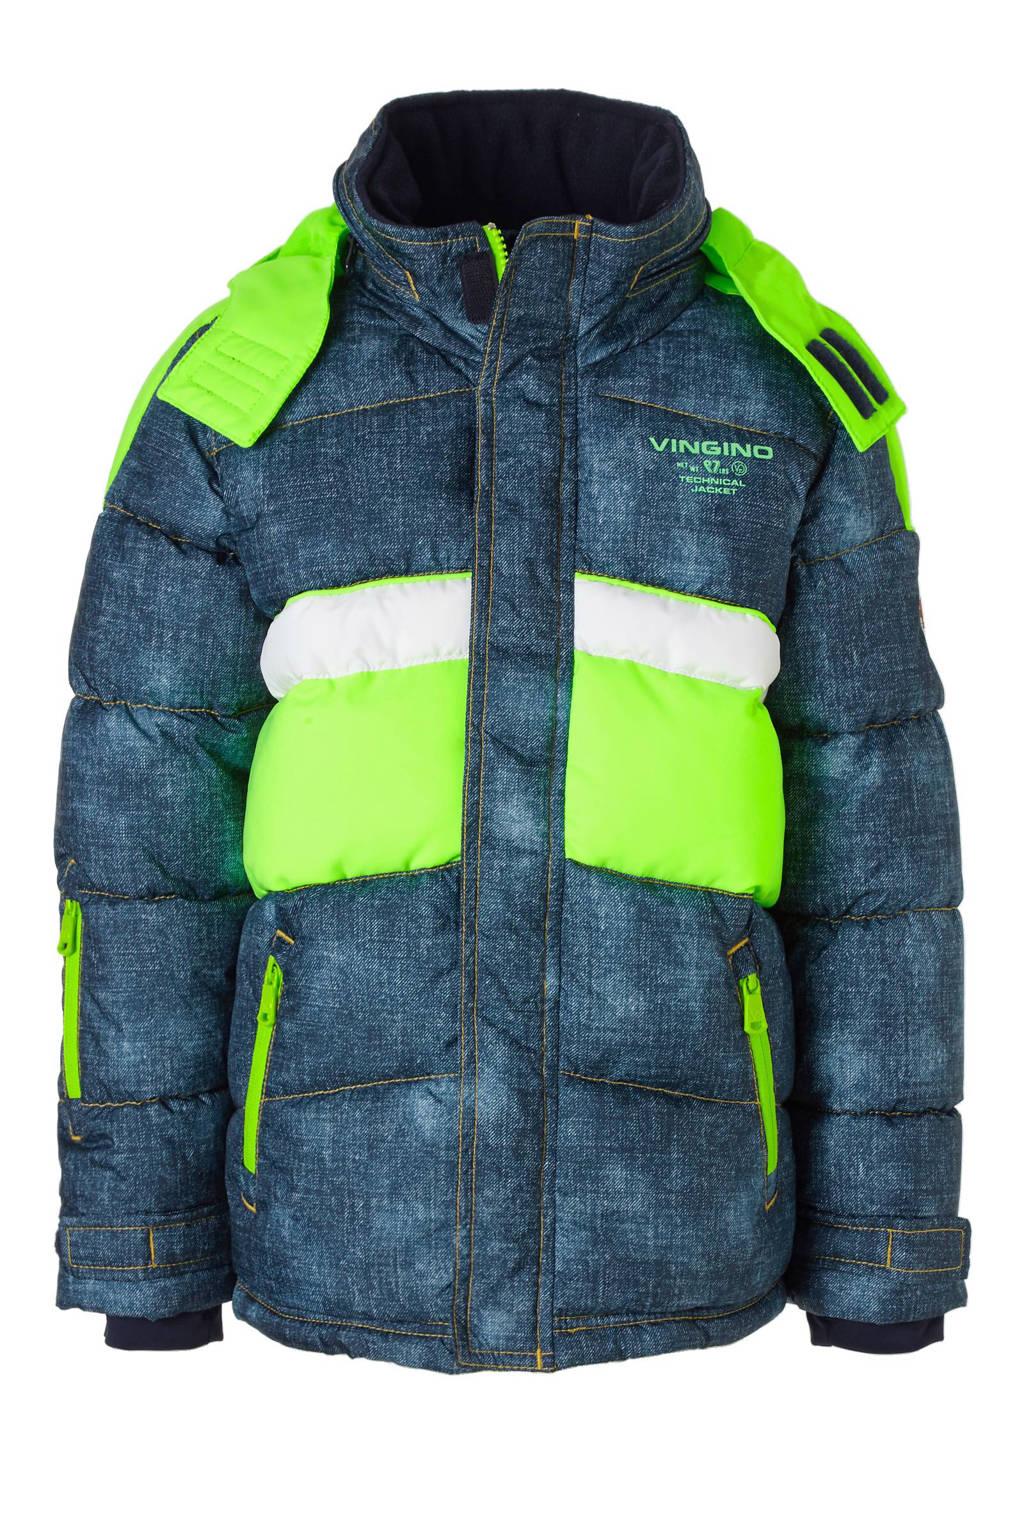 8c9fb1afa0d Vingino ski-jack, Blauw/neon groen/wit